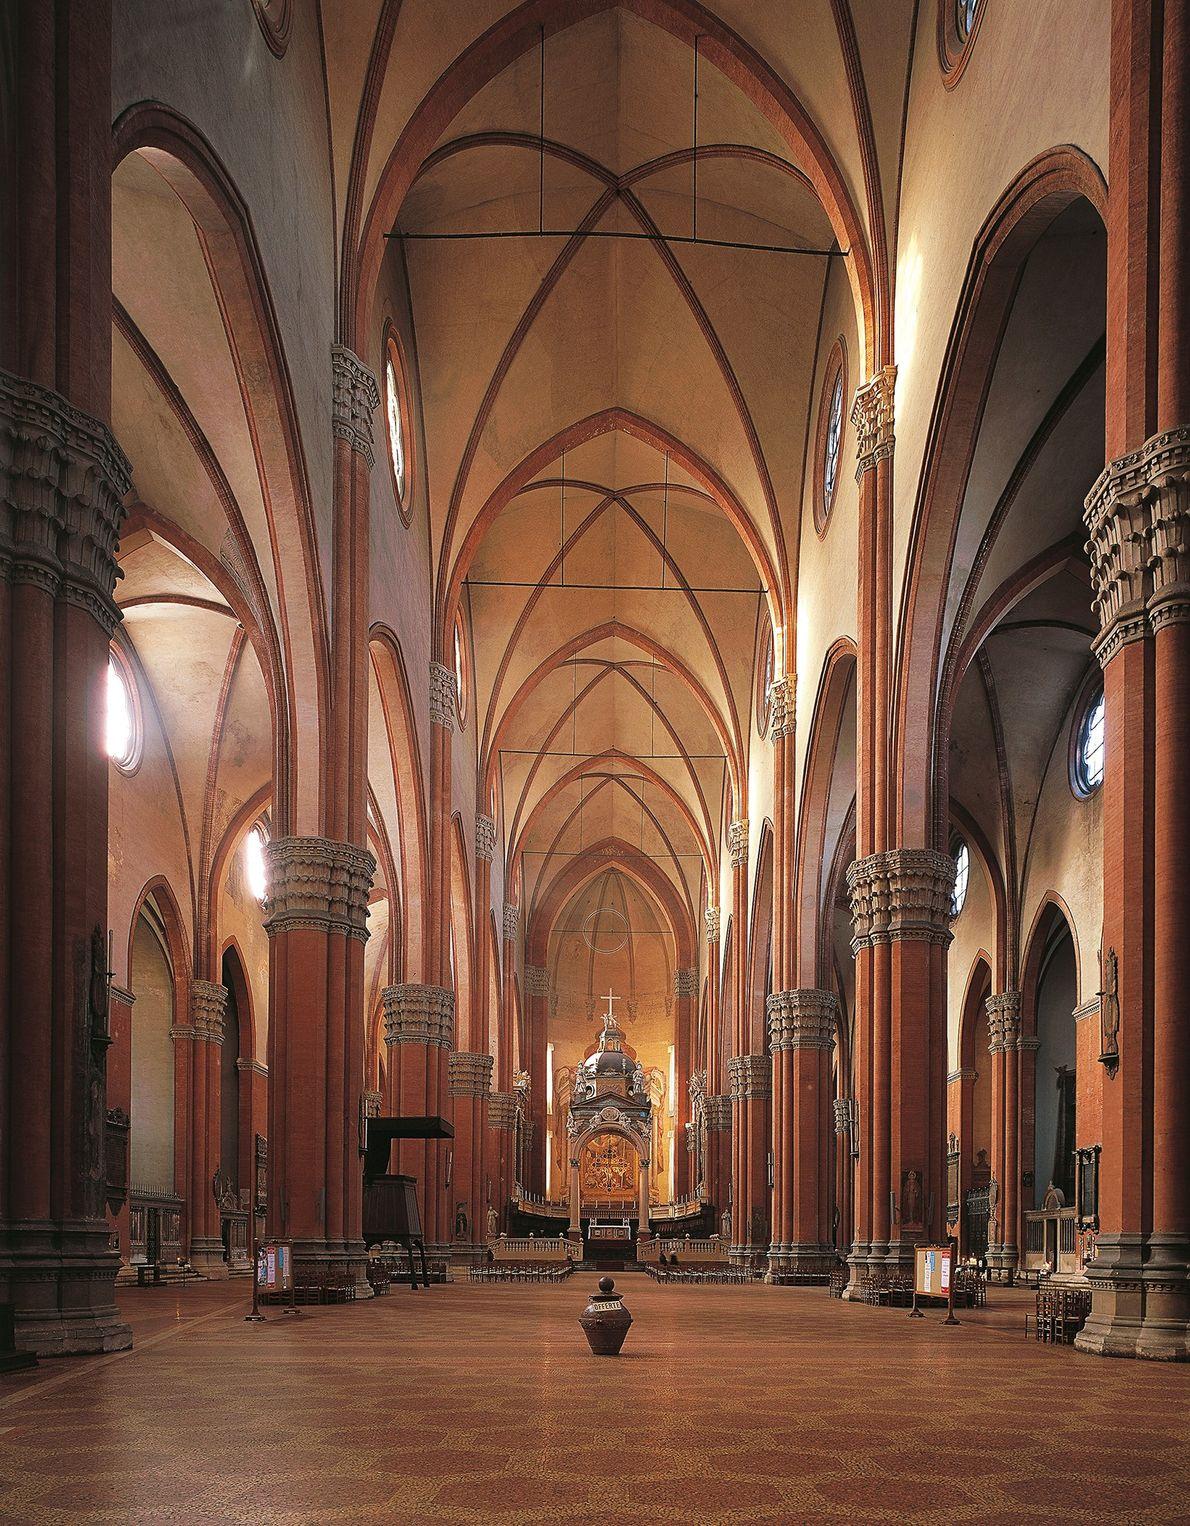 In the Basilica San Petronio in Bologna, Italy, astronomer Egnazio Danti in 1575 constructed a so-called ...